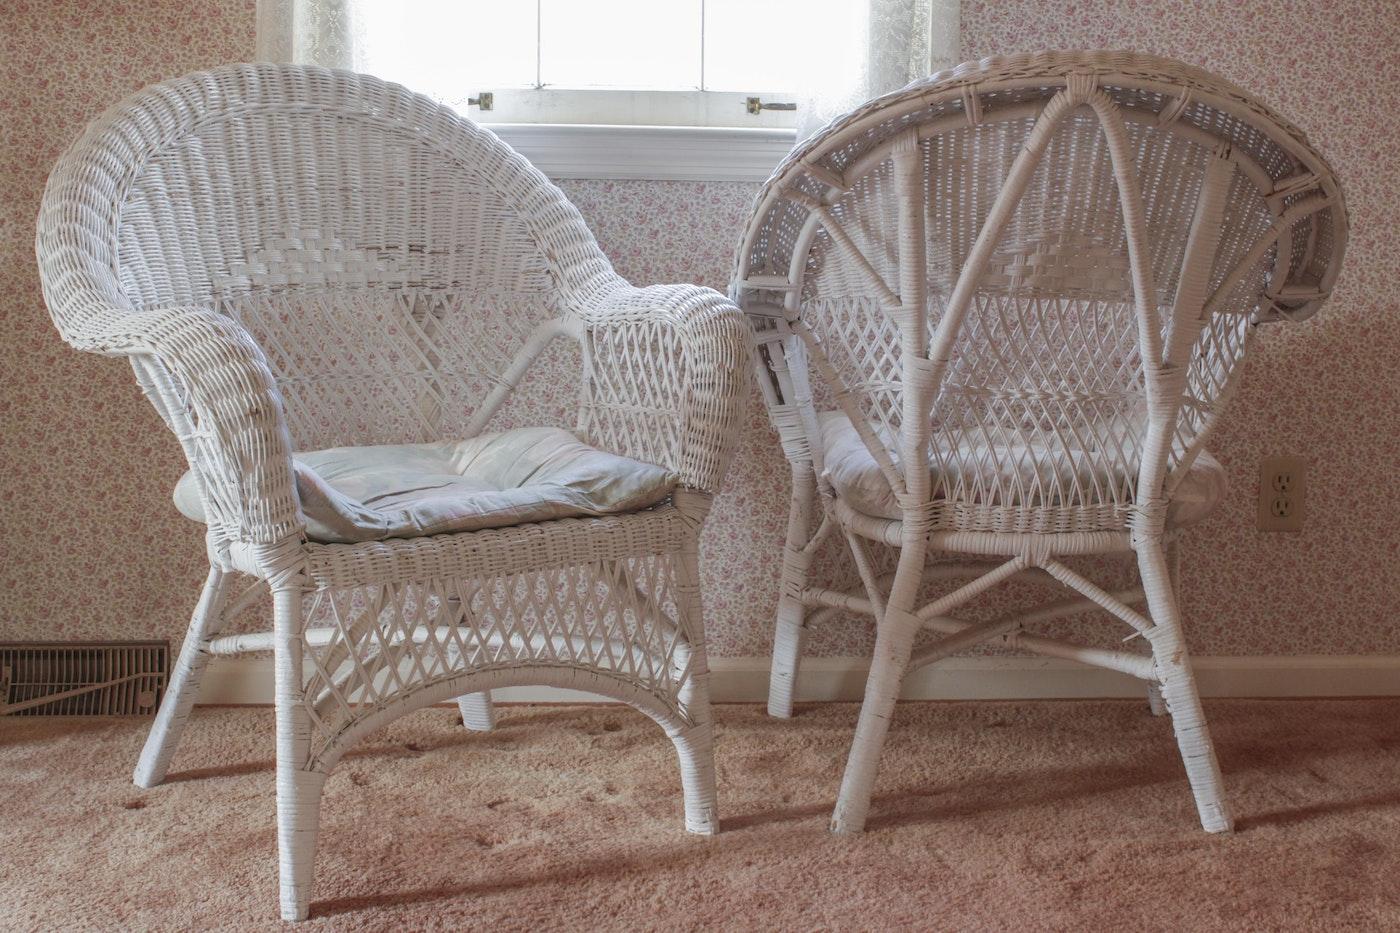 Vintage White Wicker Chairs Ebth